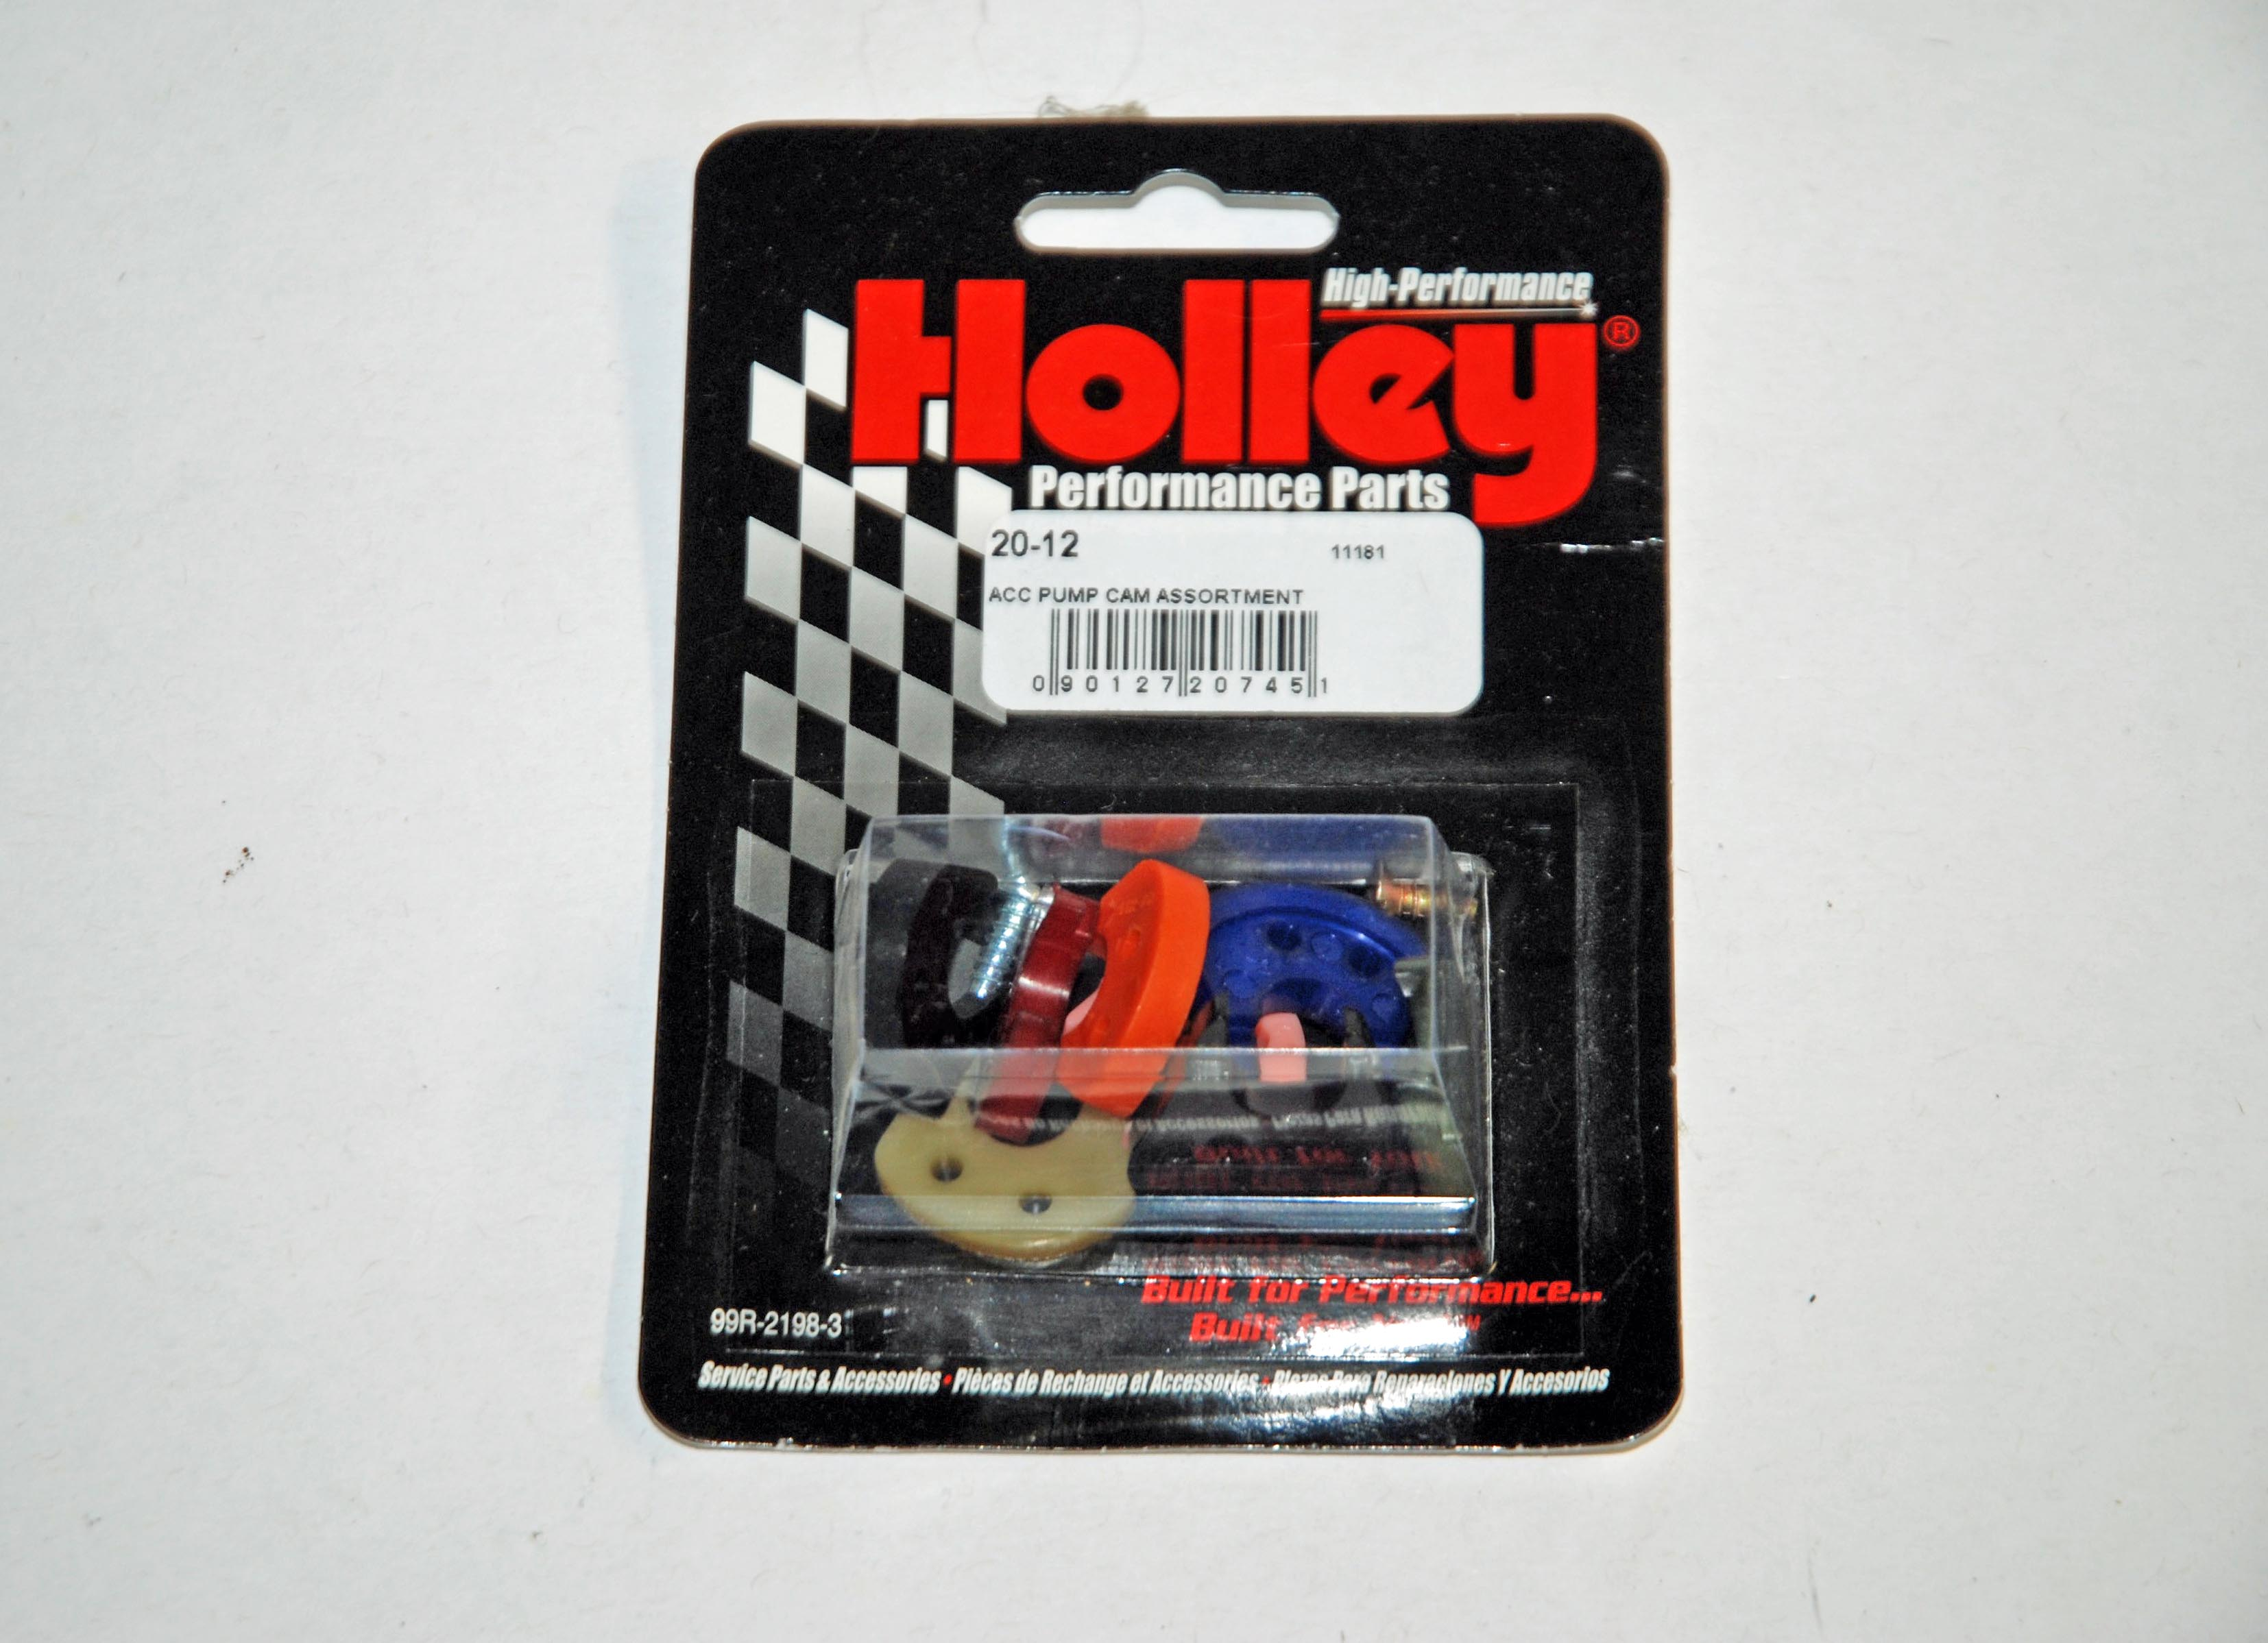 Holley Carburetor Accelerator Pump, Tuning a Carburetor, Tech, How To,